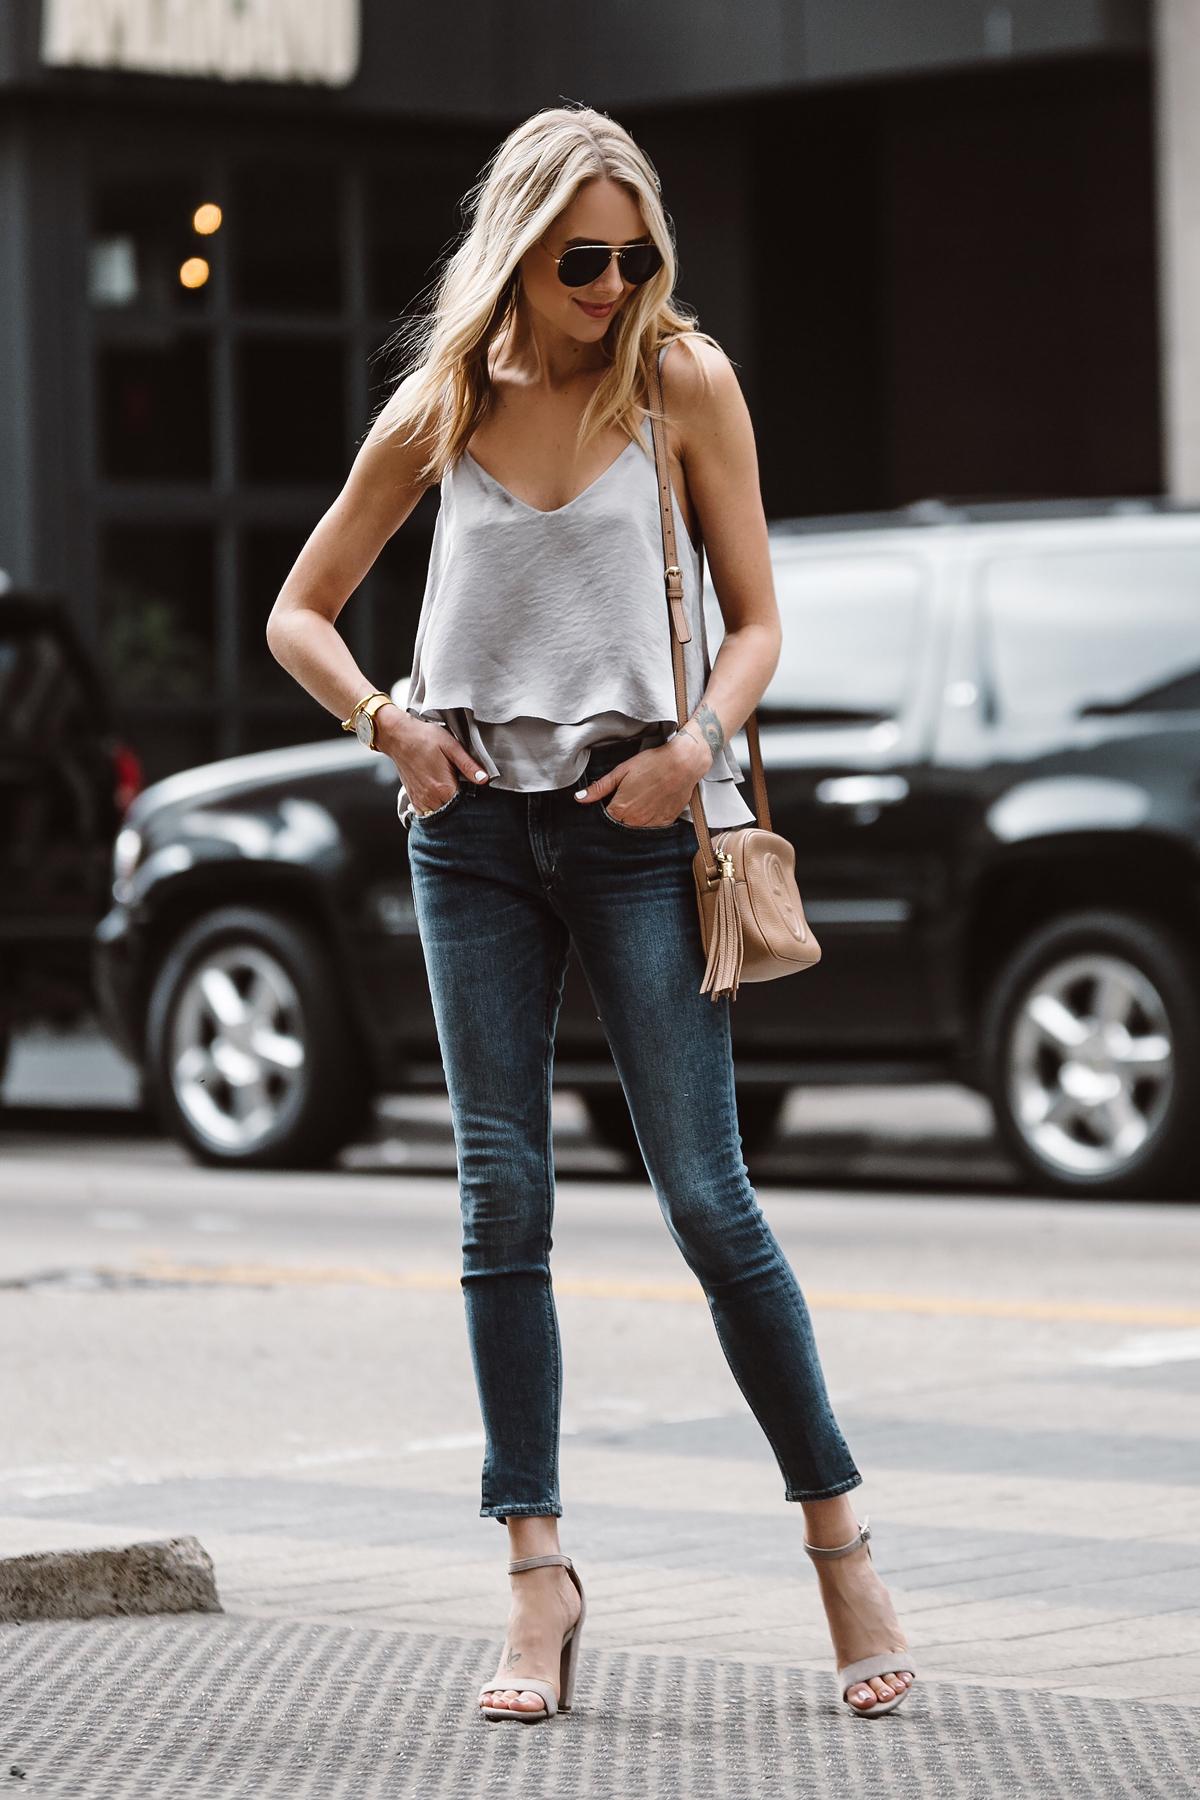 Fashion Jackson, Dallas Blogger, Fashion Blogger, Street Style, Grey Ruffle Cami, Split Hem Denim Skinny Jeans, Steve Madden Carrson Ankle Strap Heeled Sandals, Gucci Soho Disco Handbag